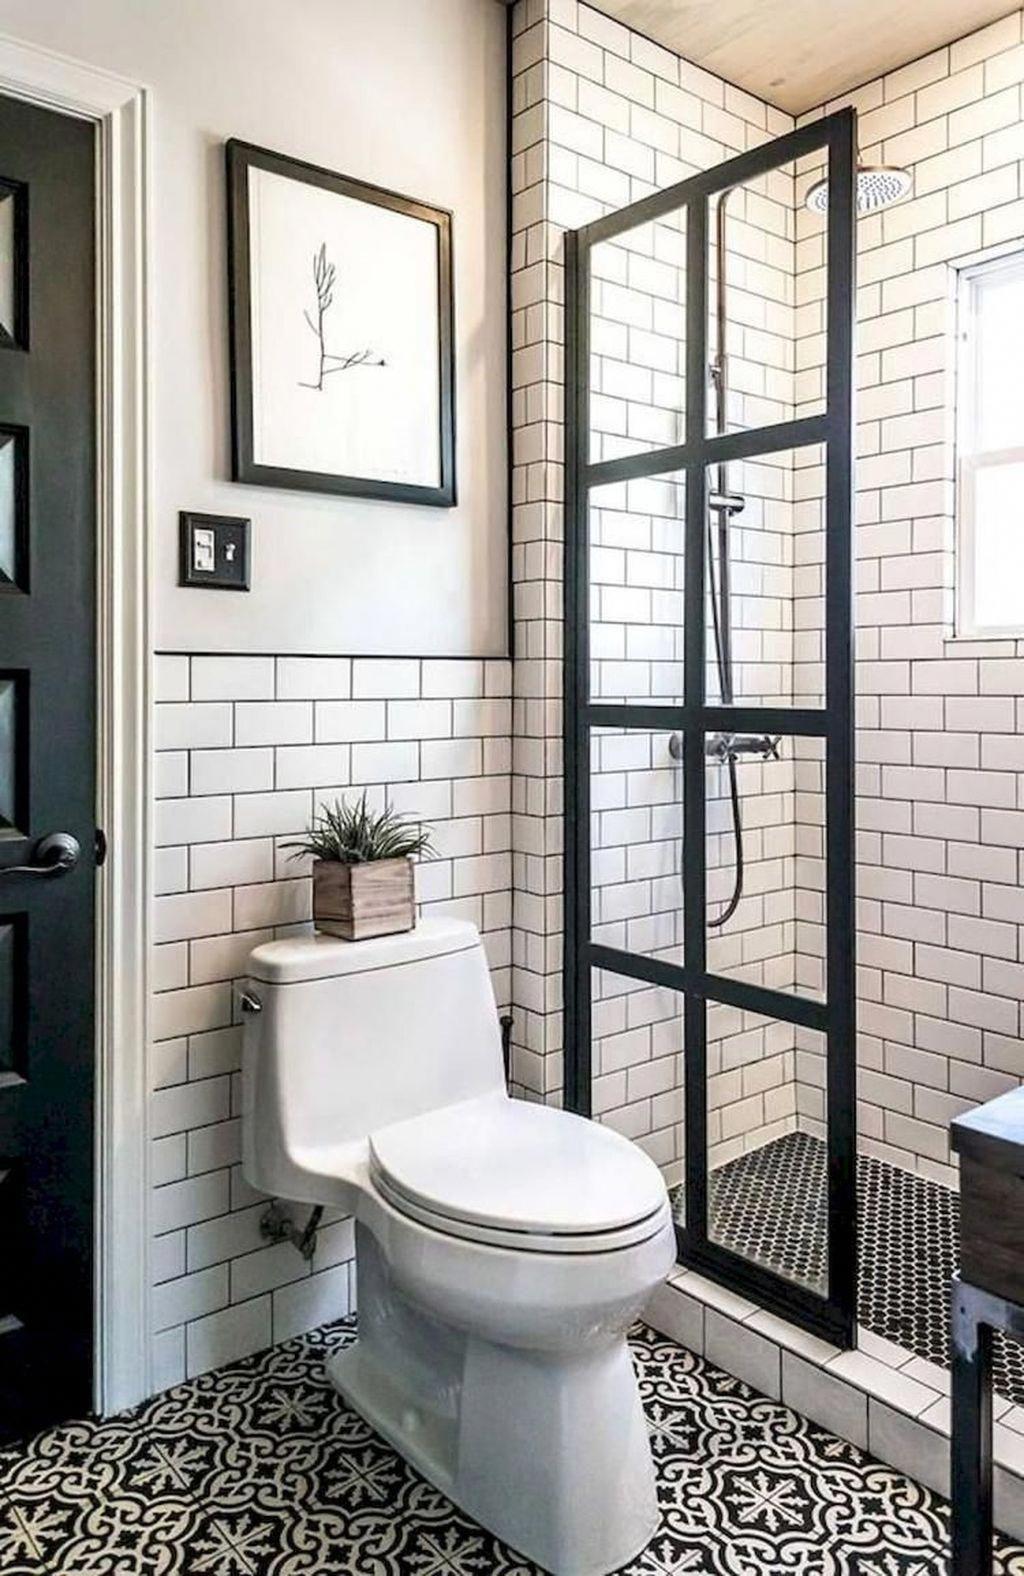 Bathroom Tile Labor Cost Small Bathroom Renovations Designs It Is Small Bathroom Renovations S Bathroom Remodel Shower Bathroom Renovation Diy Small Bathroom